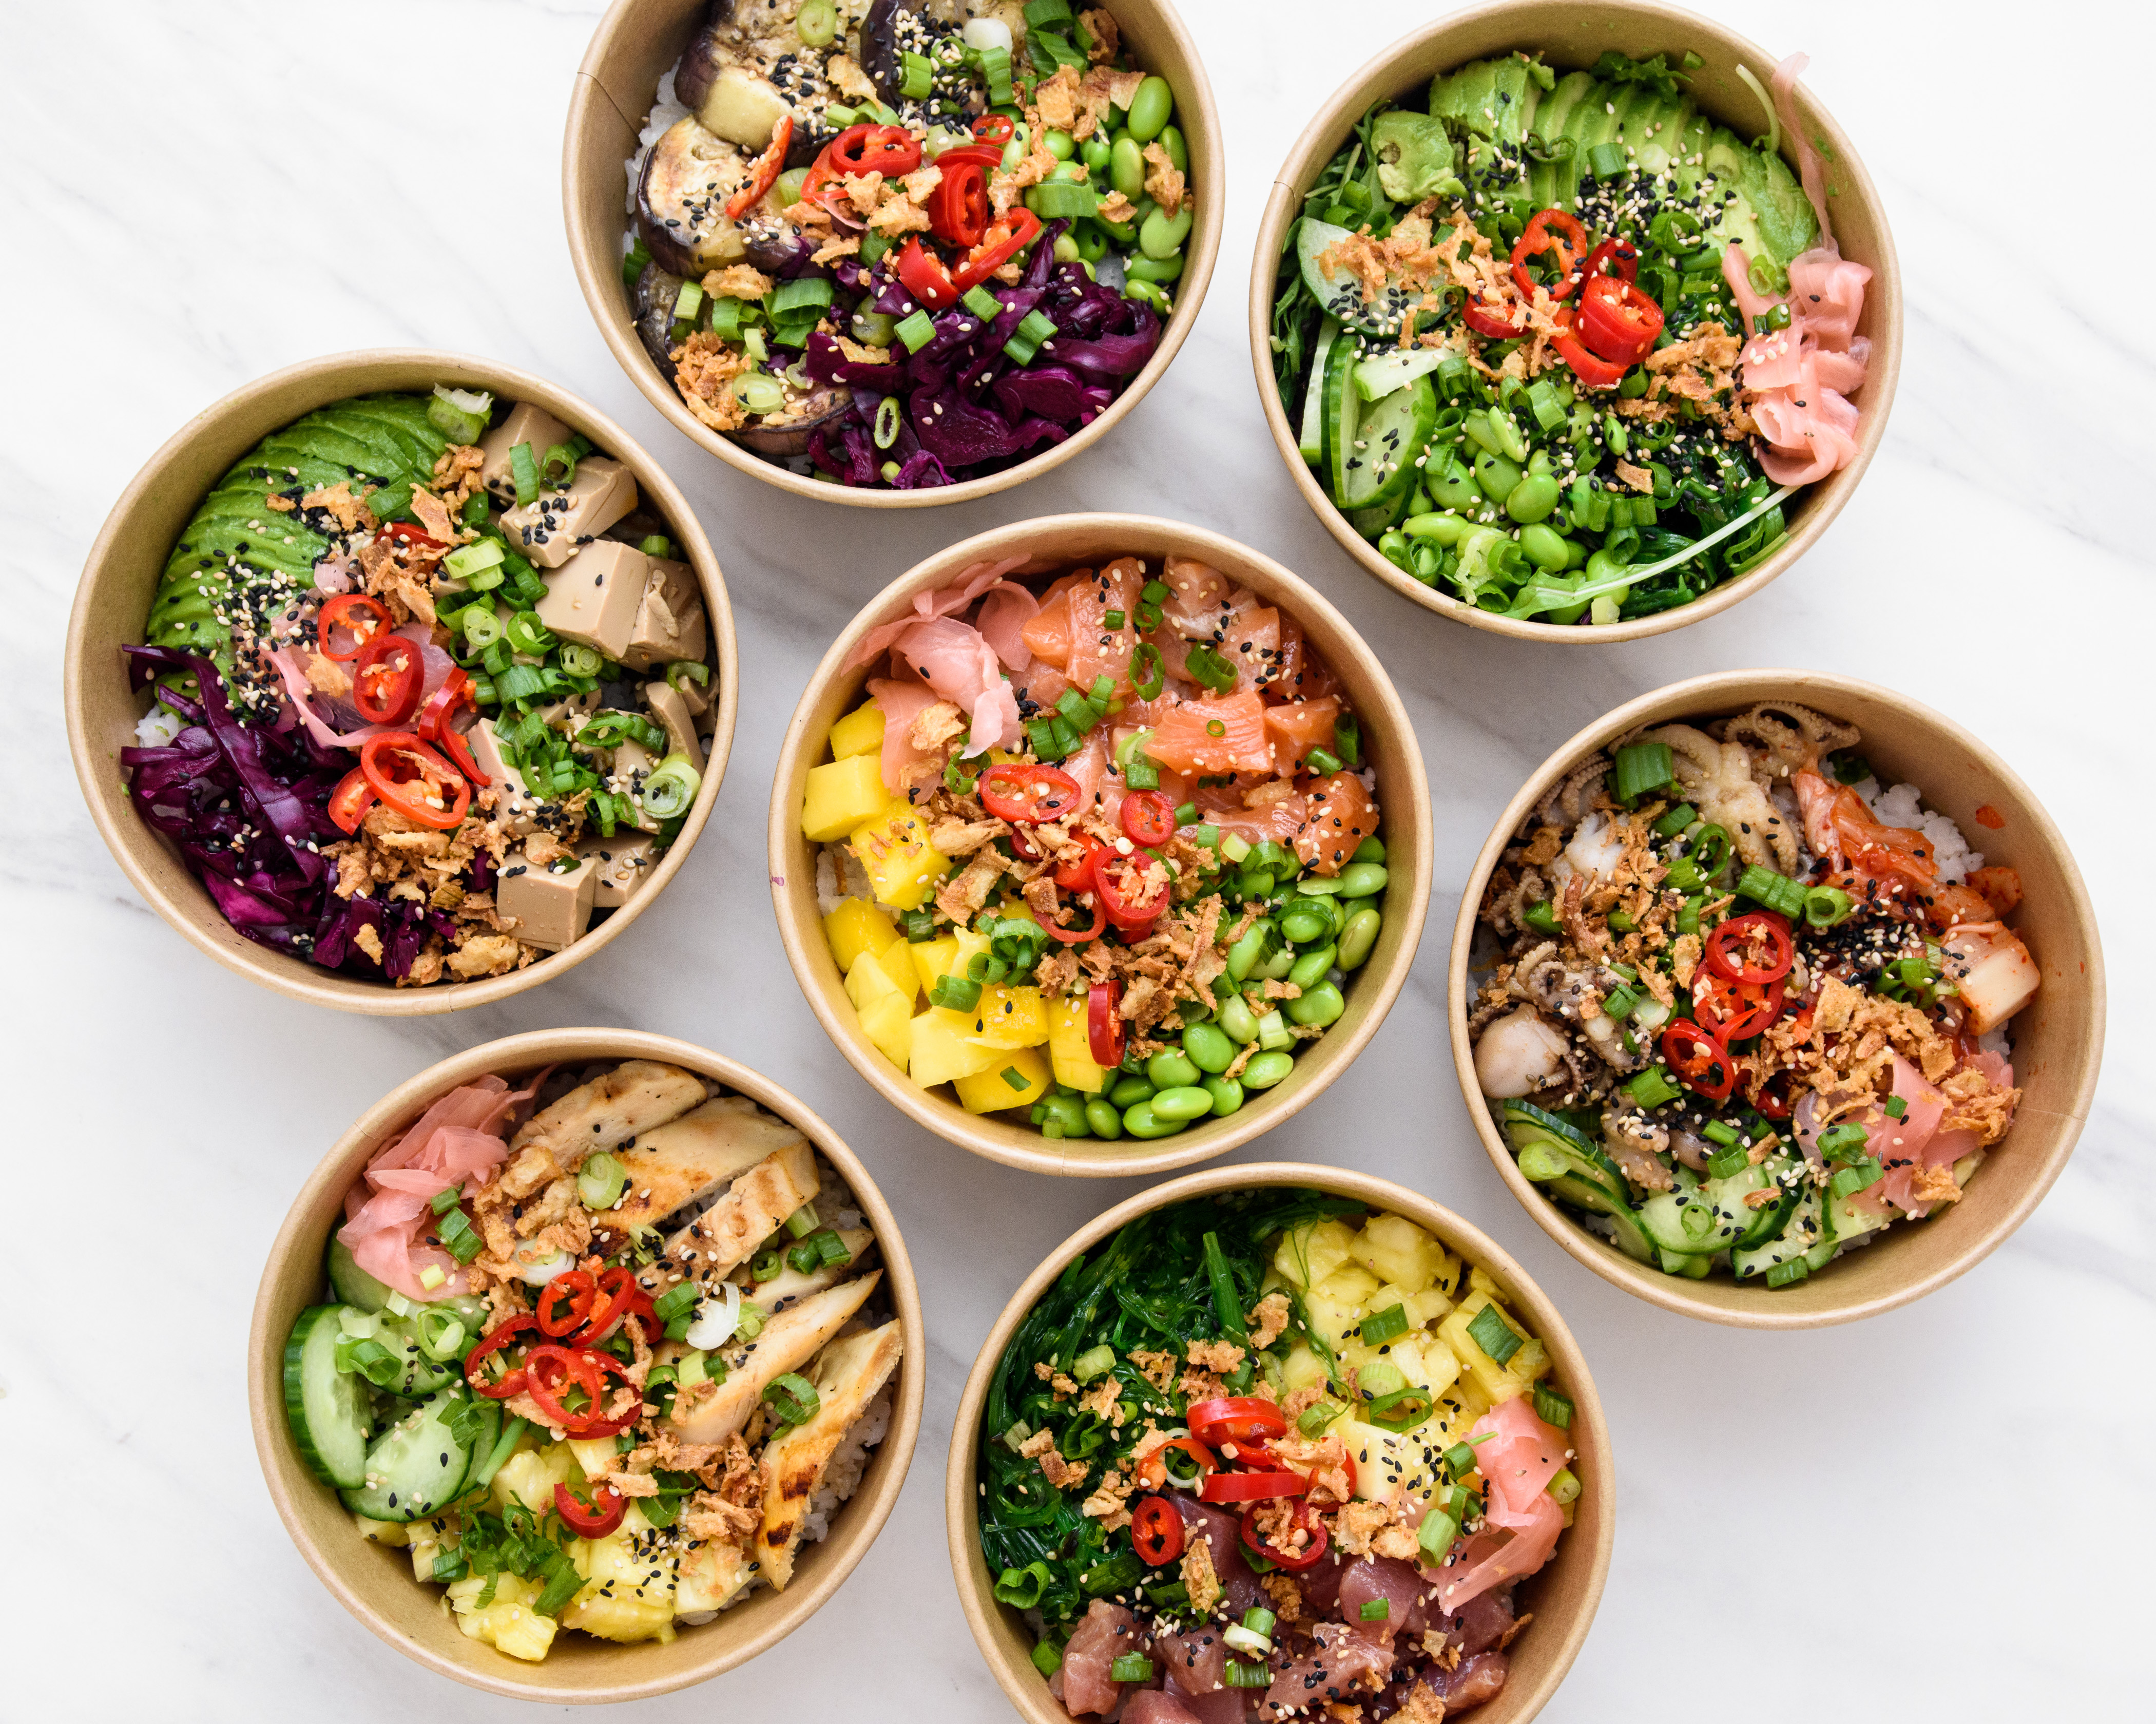 Poké bowls in London - Maui poke